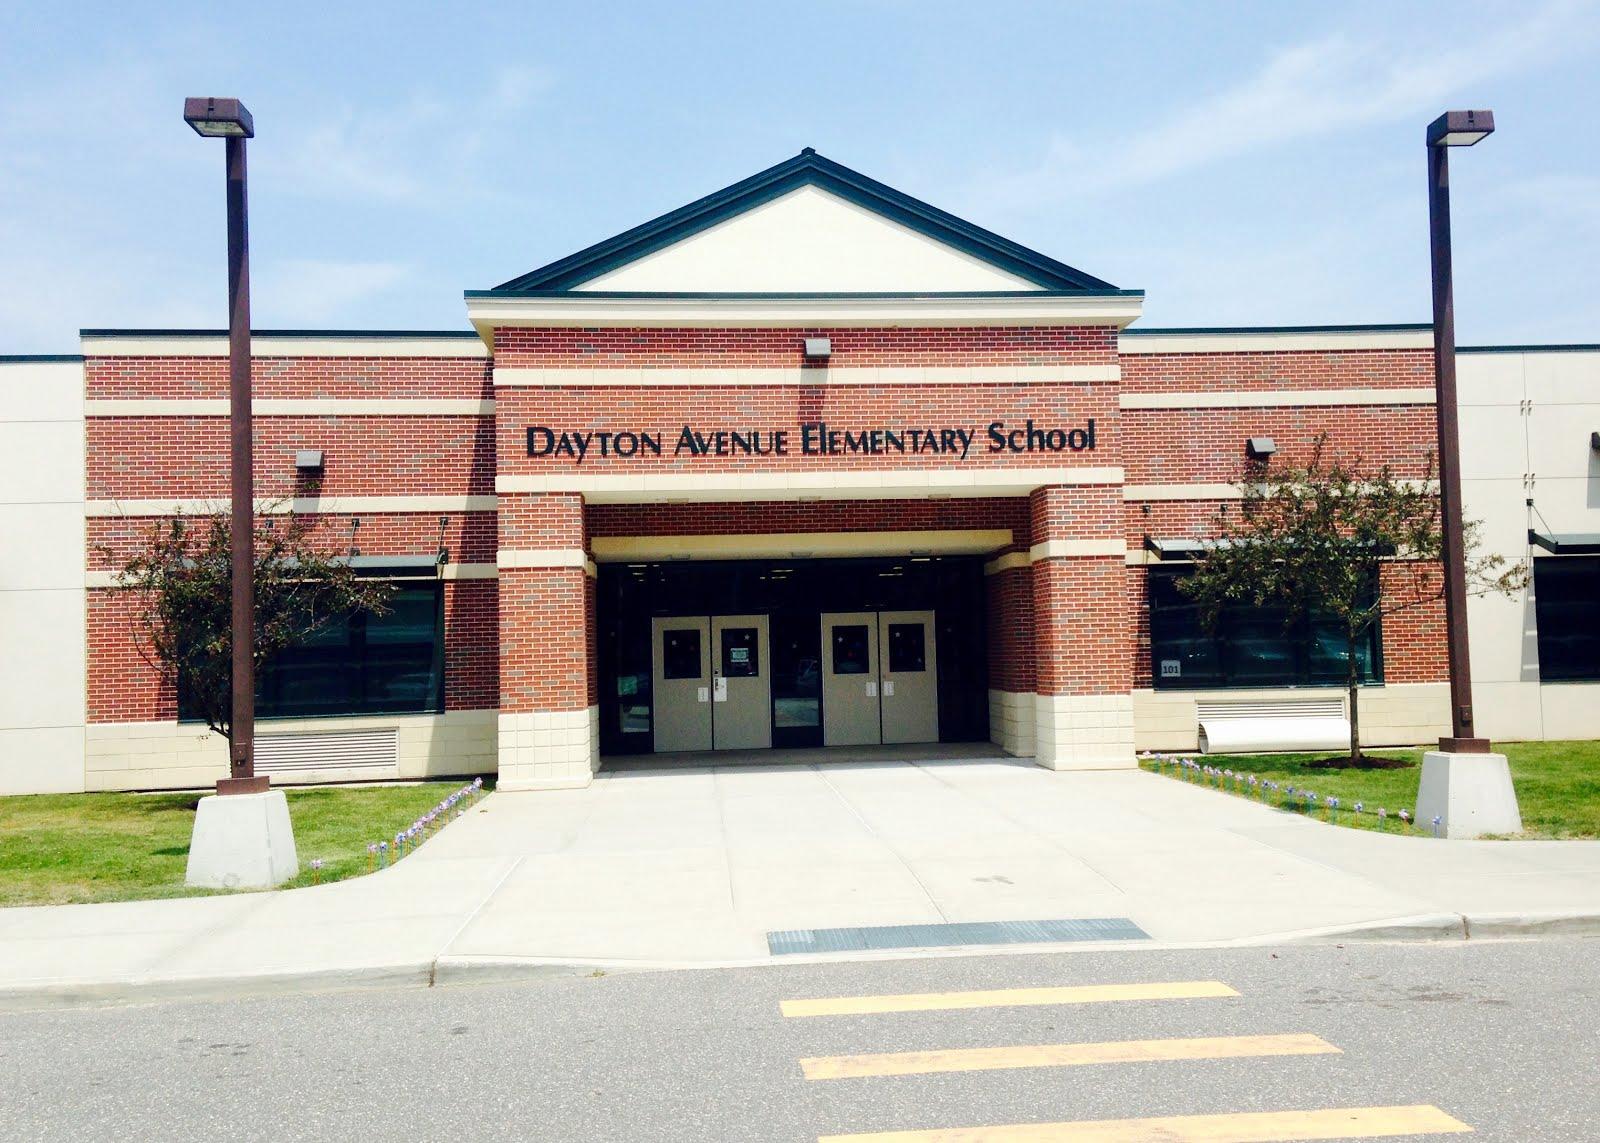 Dayton Avenue Elementary School